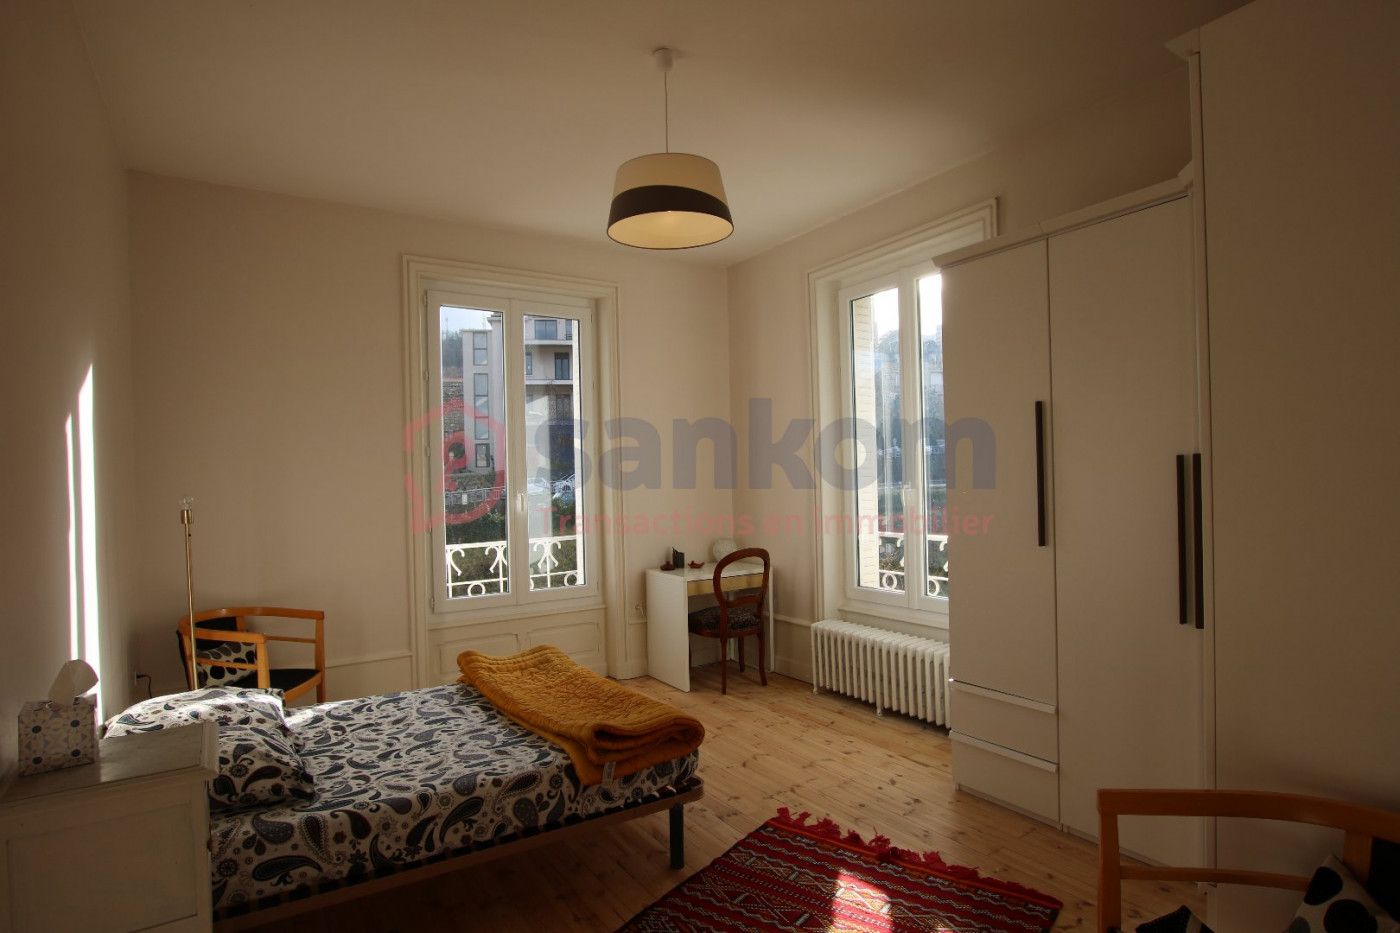 A vendre  Le Puy En Velay   Réf 43002184 - Belledent nadine